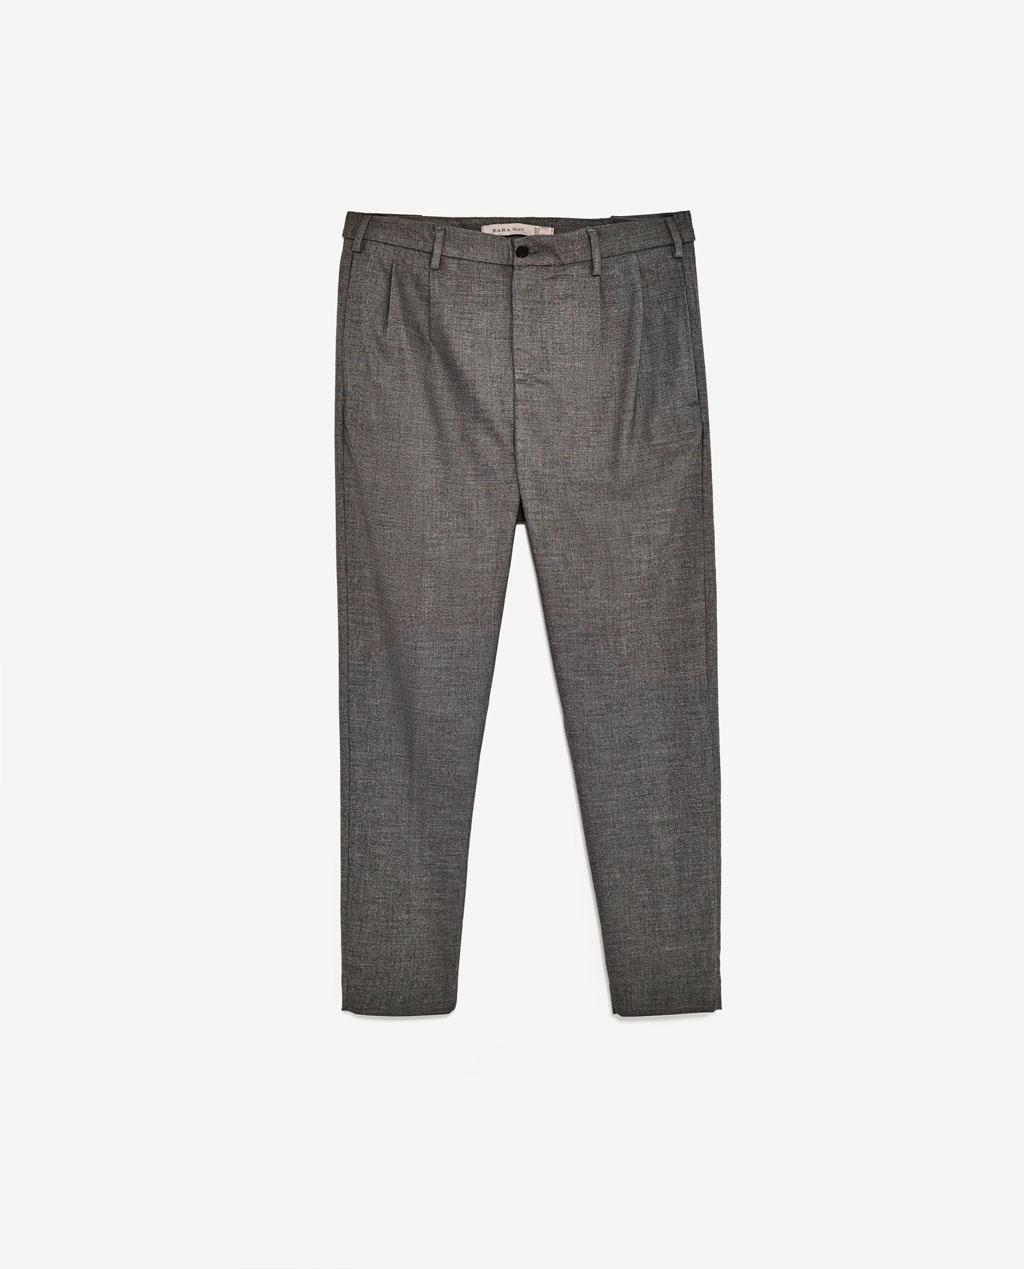 Панталон ZARA; 39.99лв